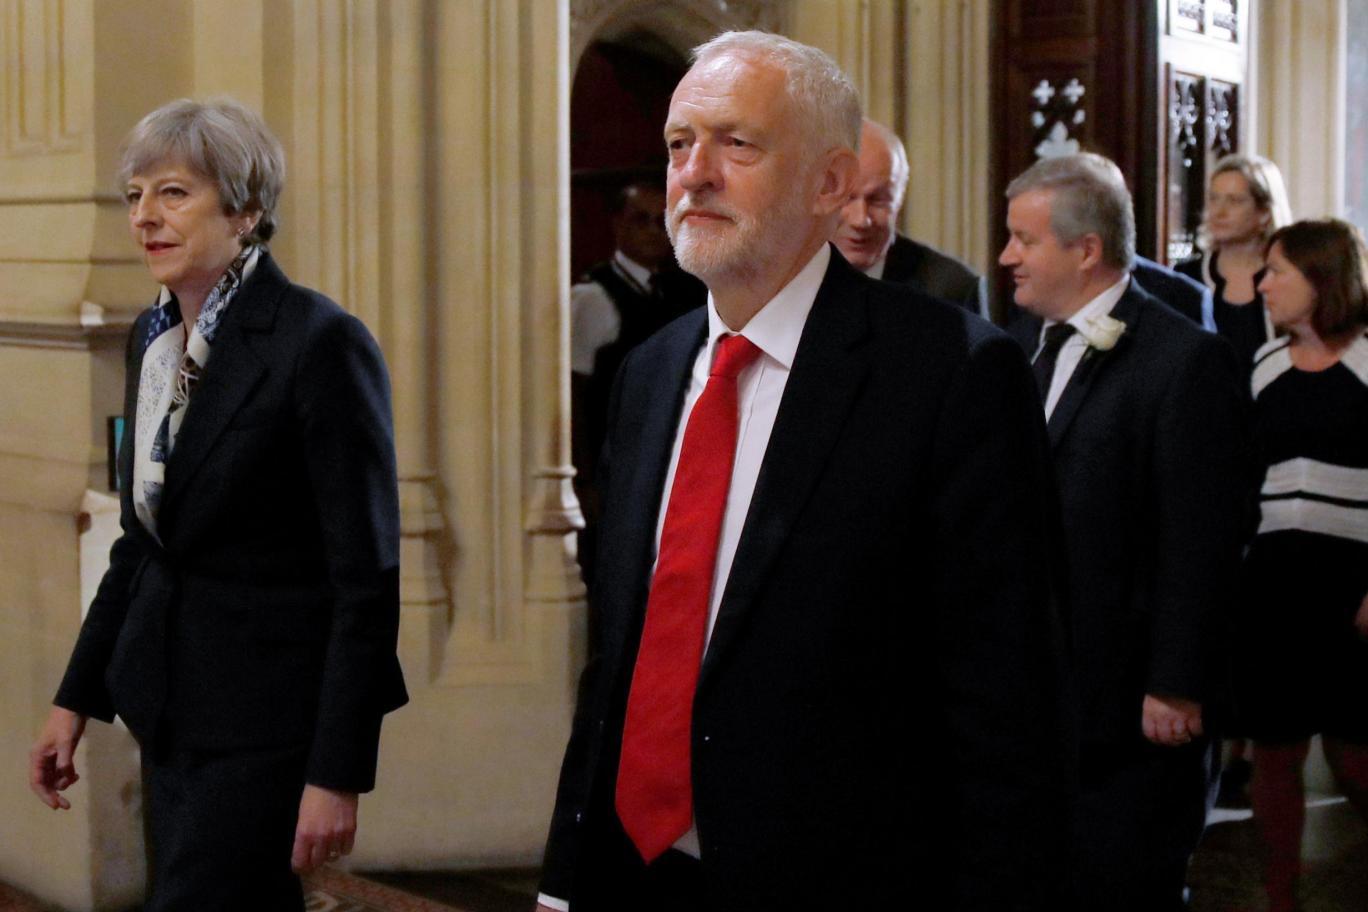 Queen's Speech mum on Trump's United Kingdom  state visit